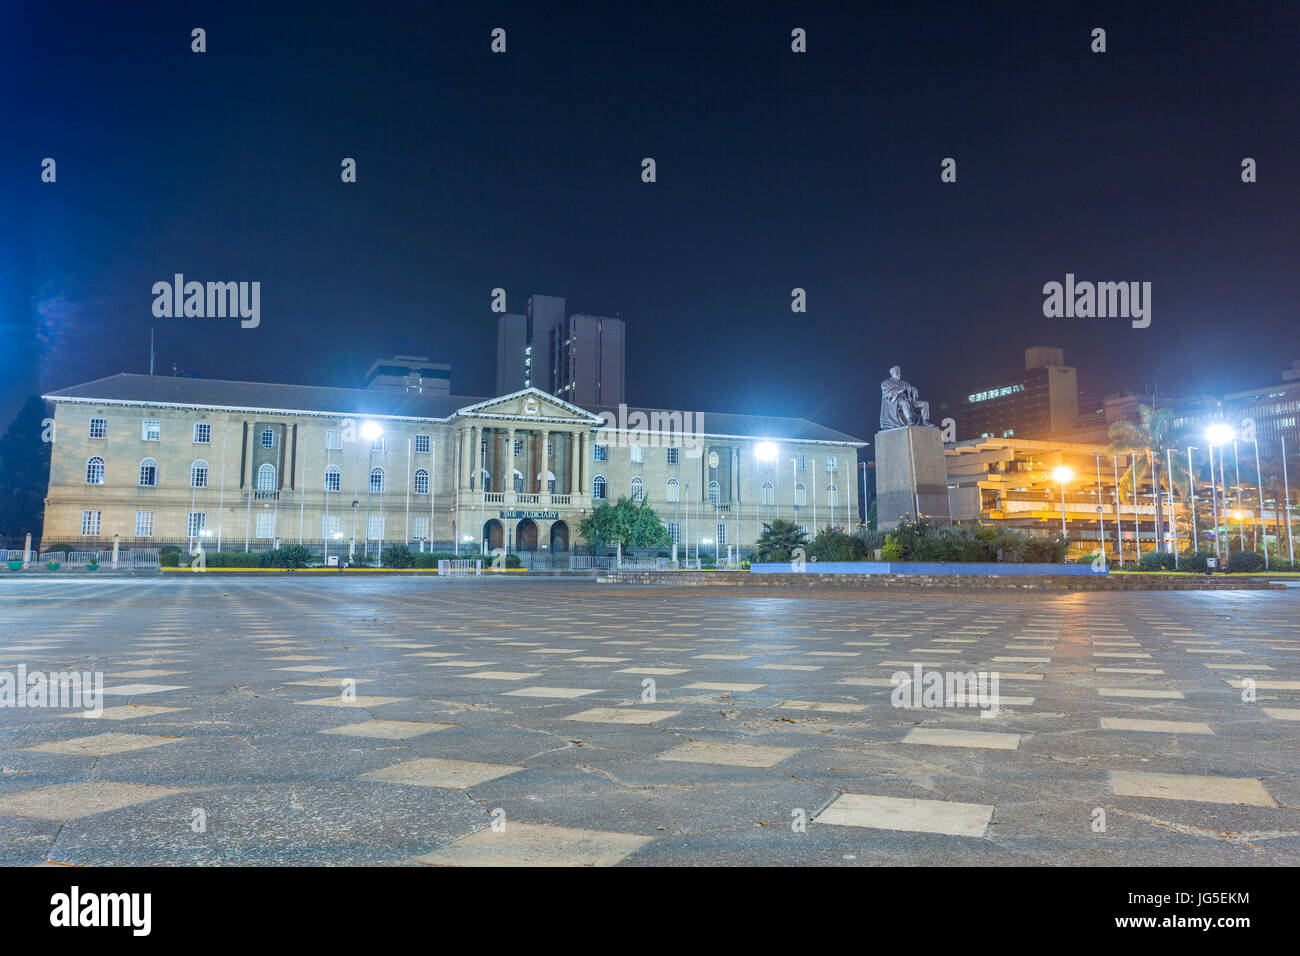 Supreme court, The Judiciary building, Nairobi, Kenya - Stock Image